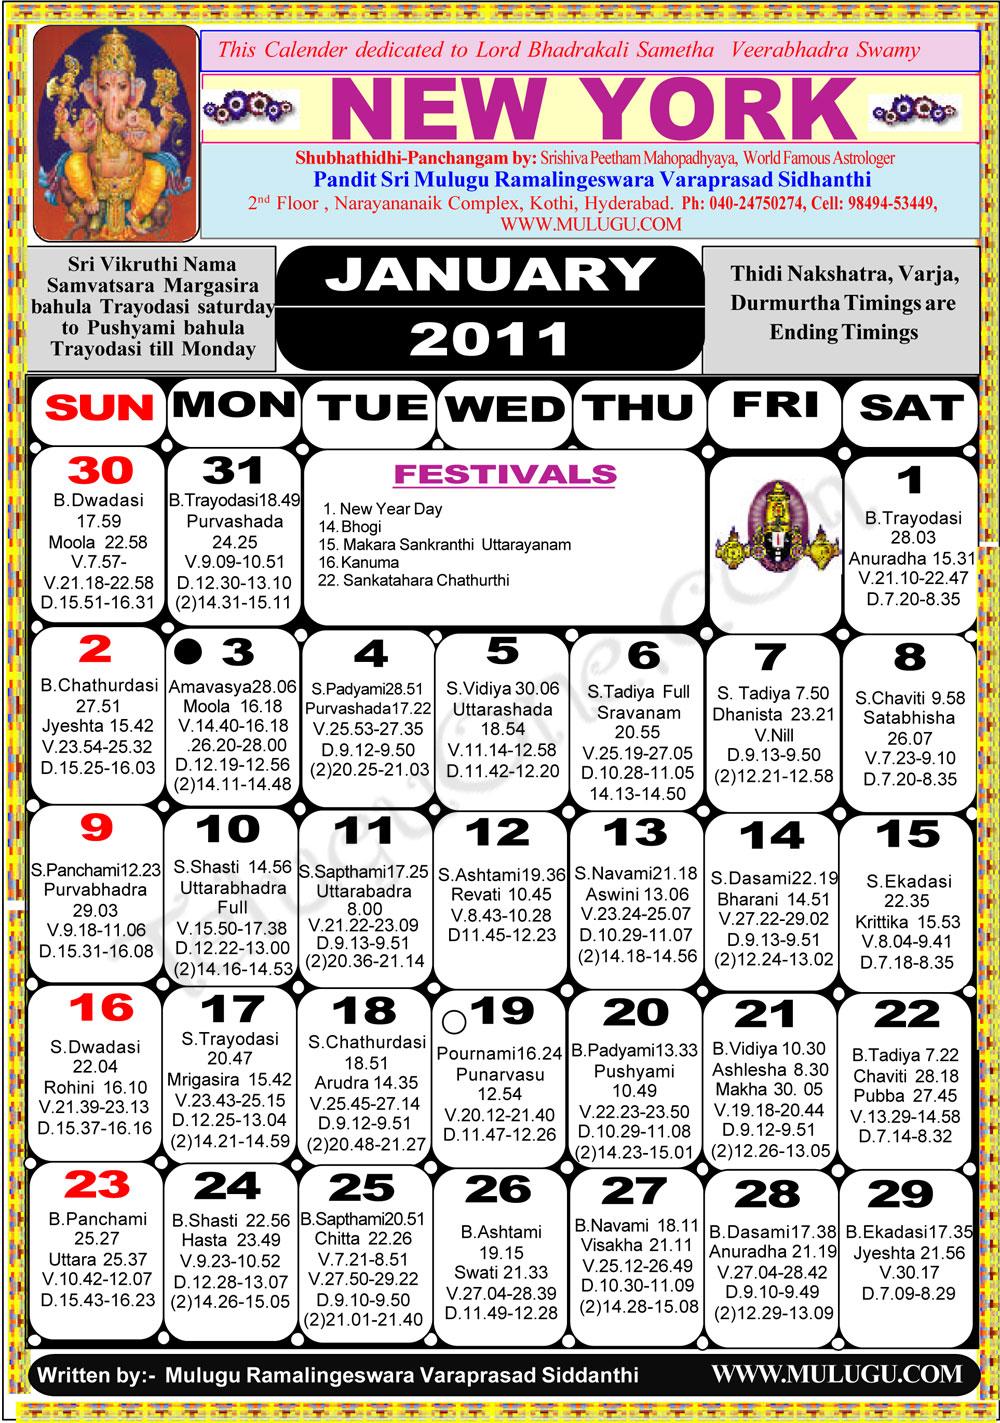 New York Telugu Calendar 2011  Astrology Online   horoscope